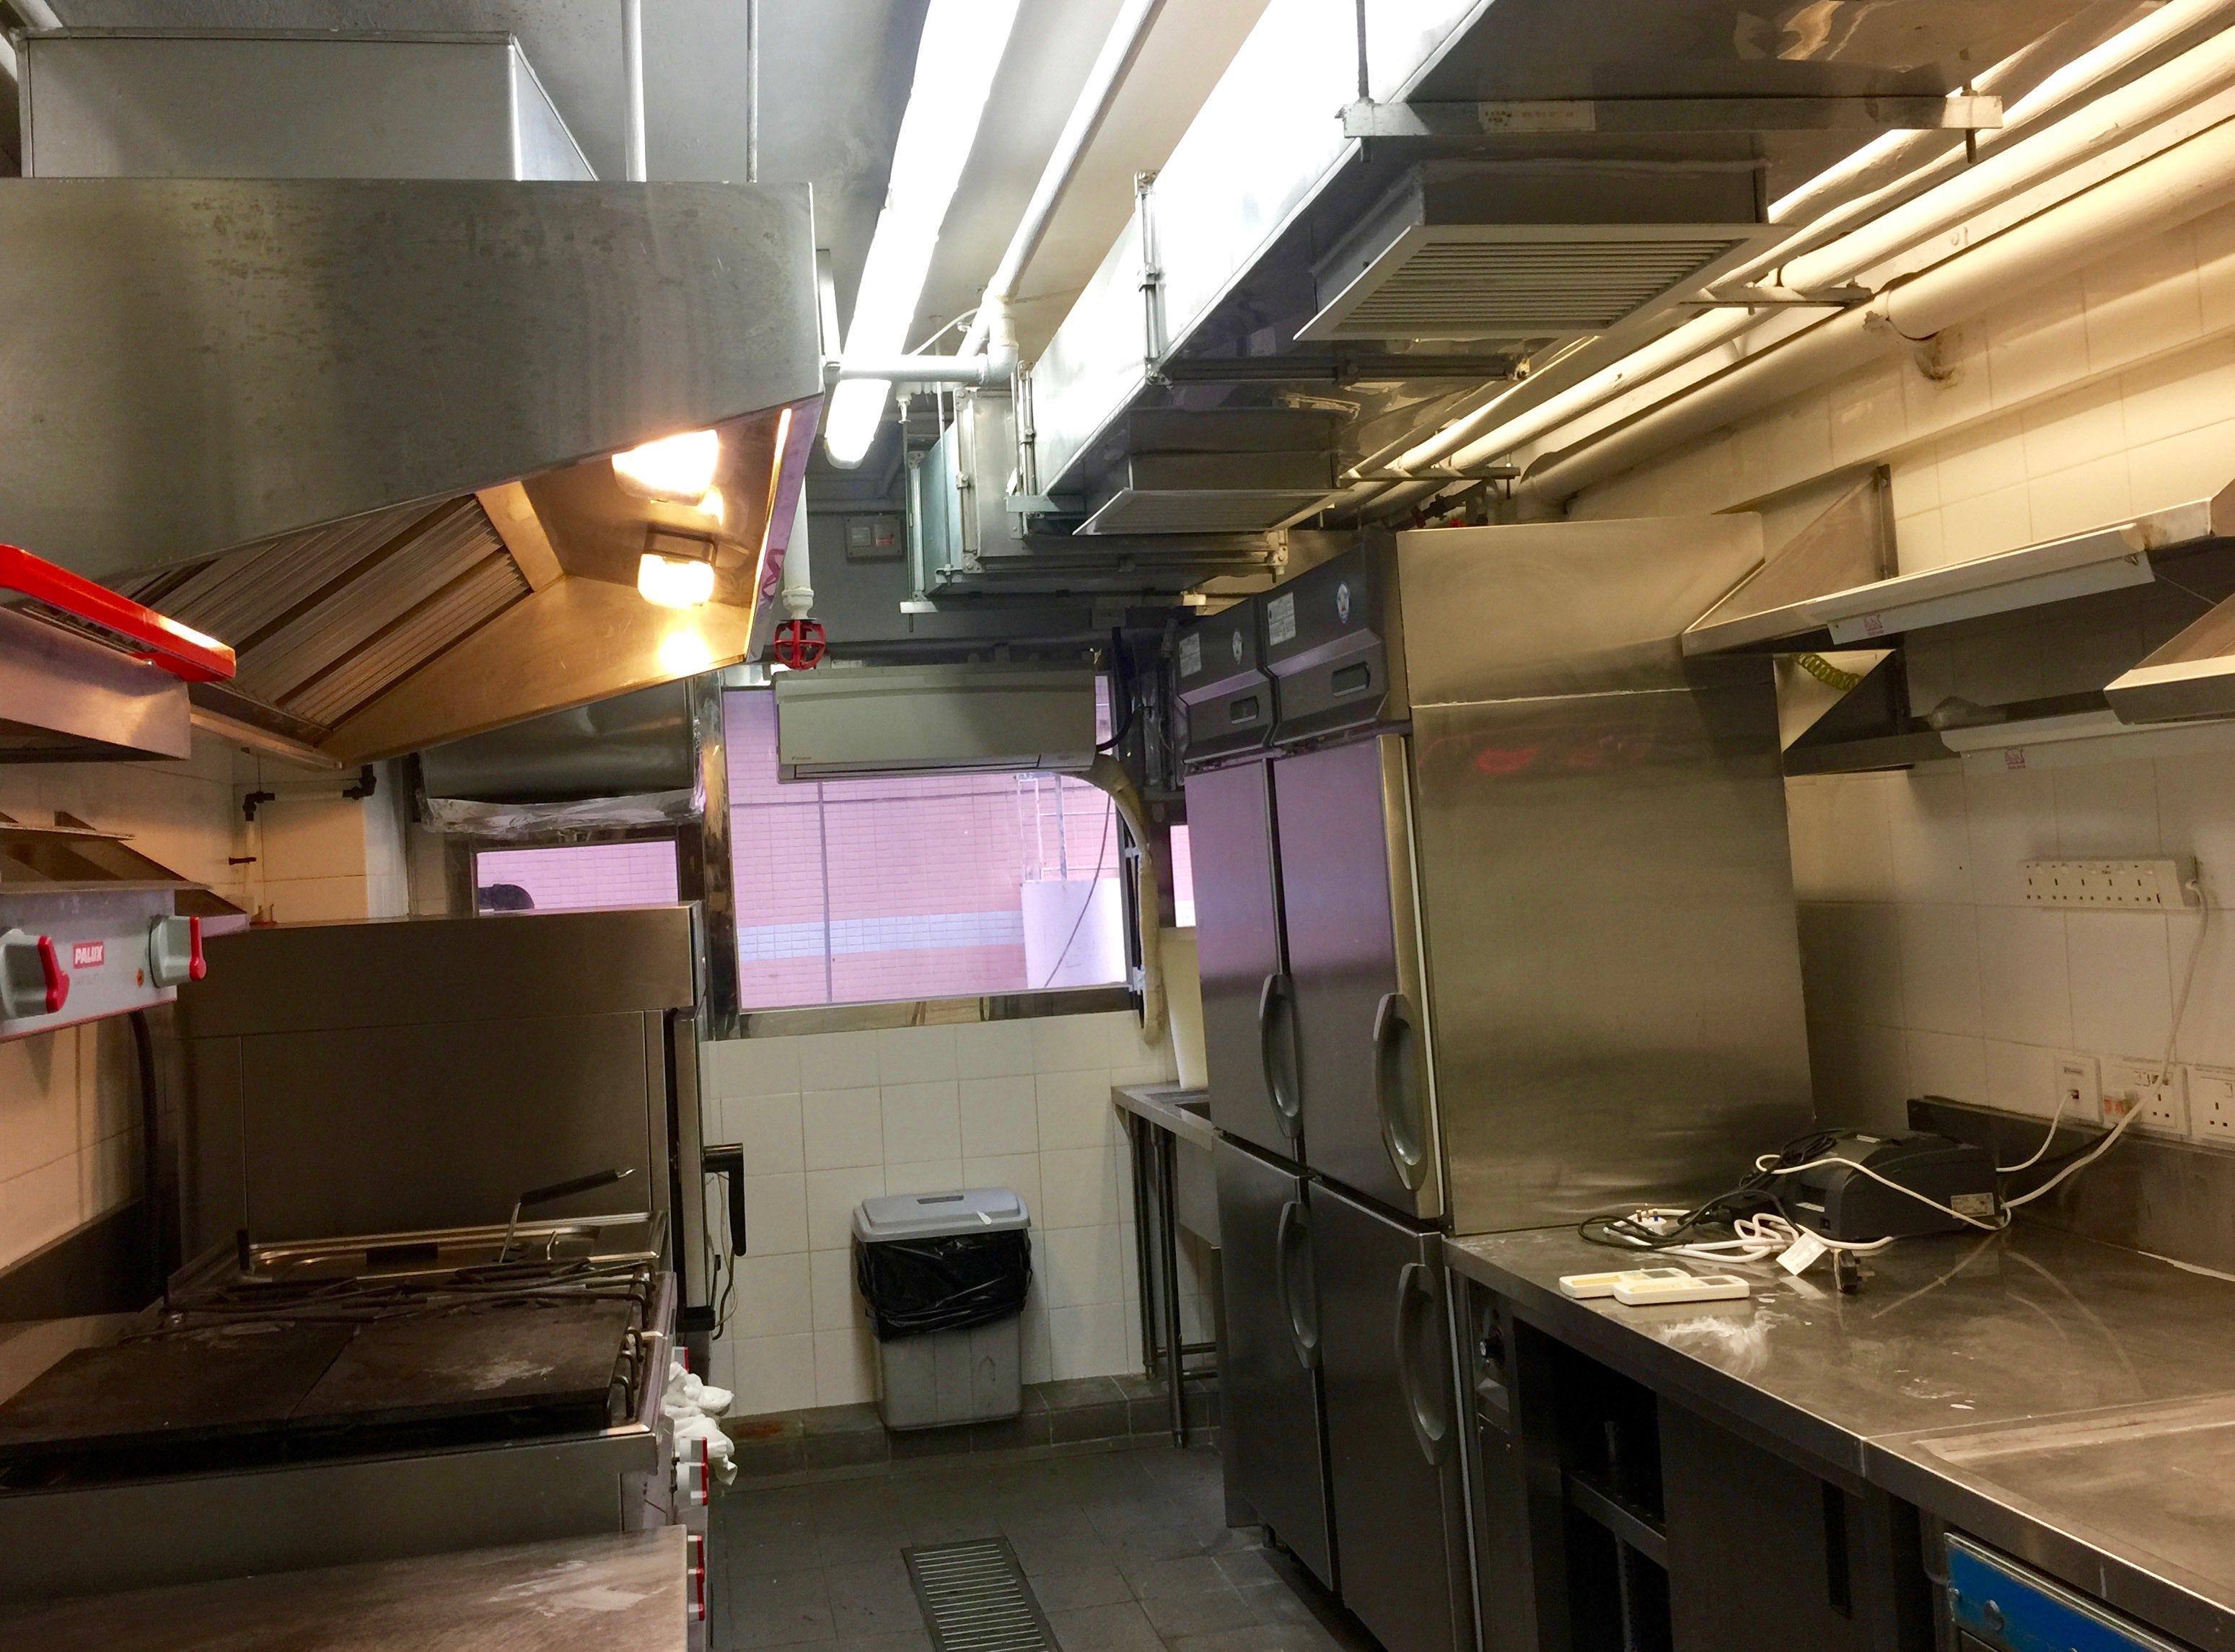 Hong Kong Sheung Wan restaurant full kitchen licence for lease